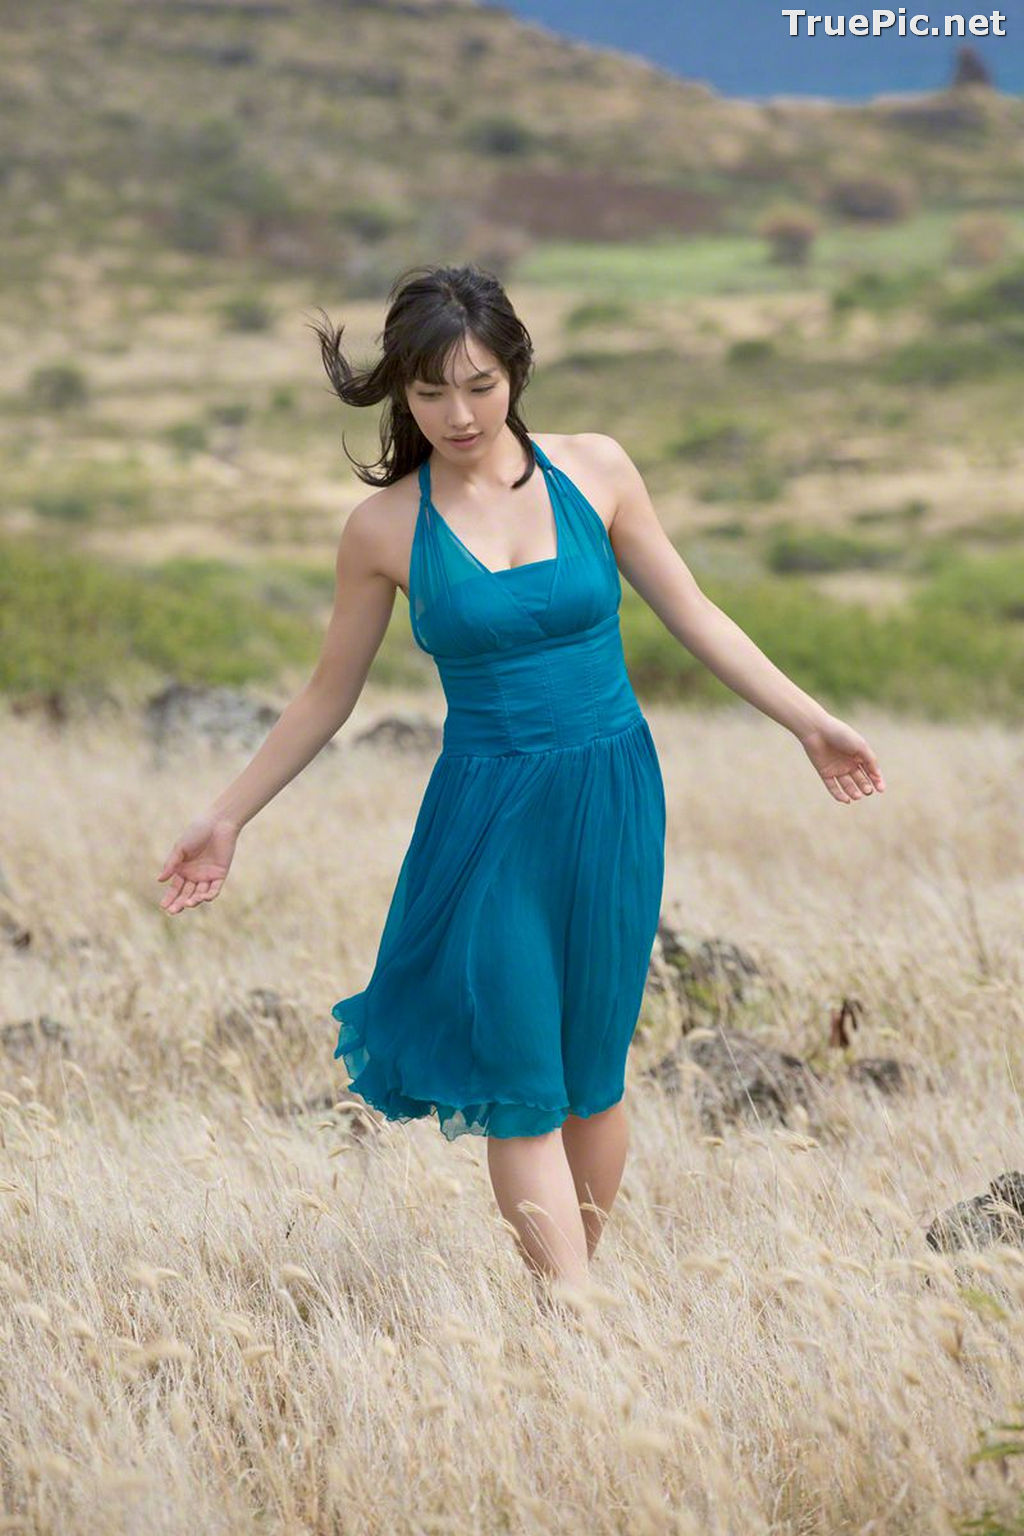 Image Wanibooks No.127 - Japanese Gravure Idol and Actress - Anna Konno - TruePic.net - Picture-3